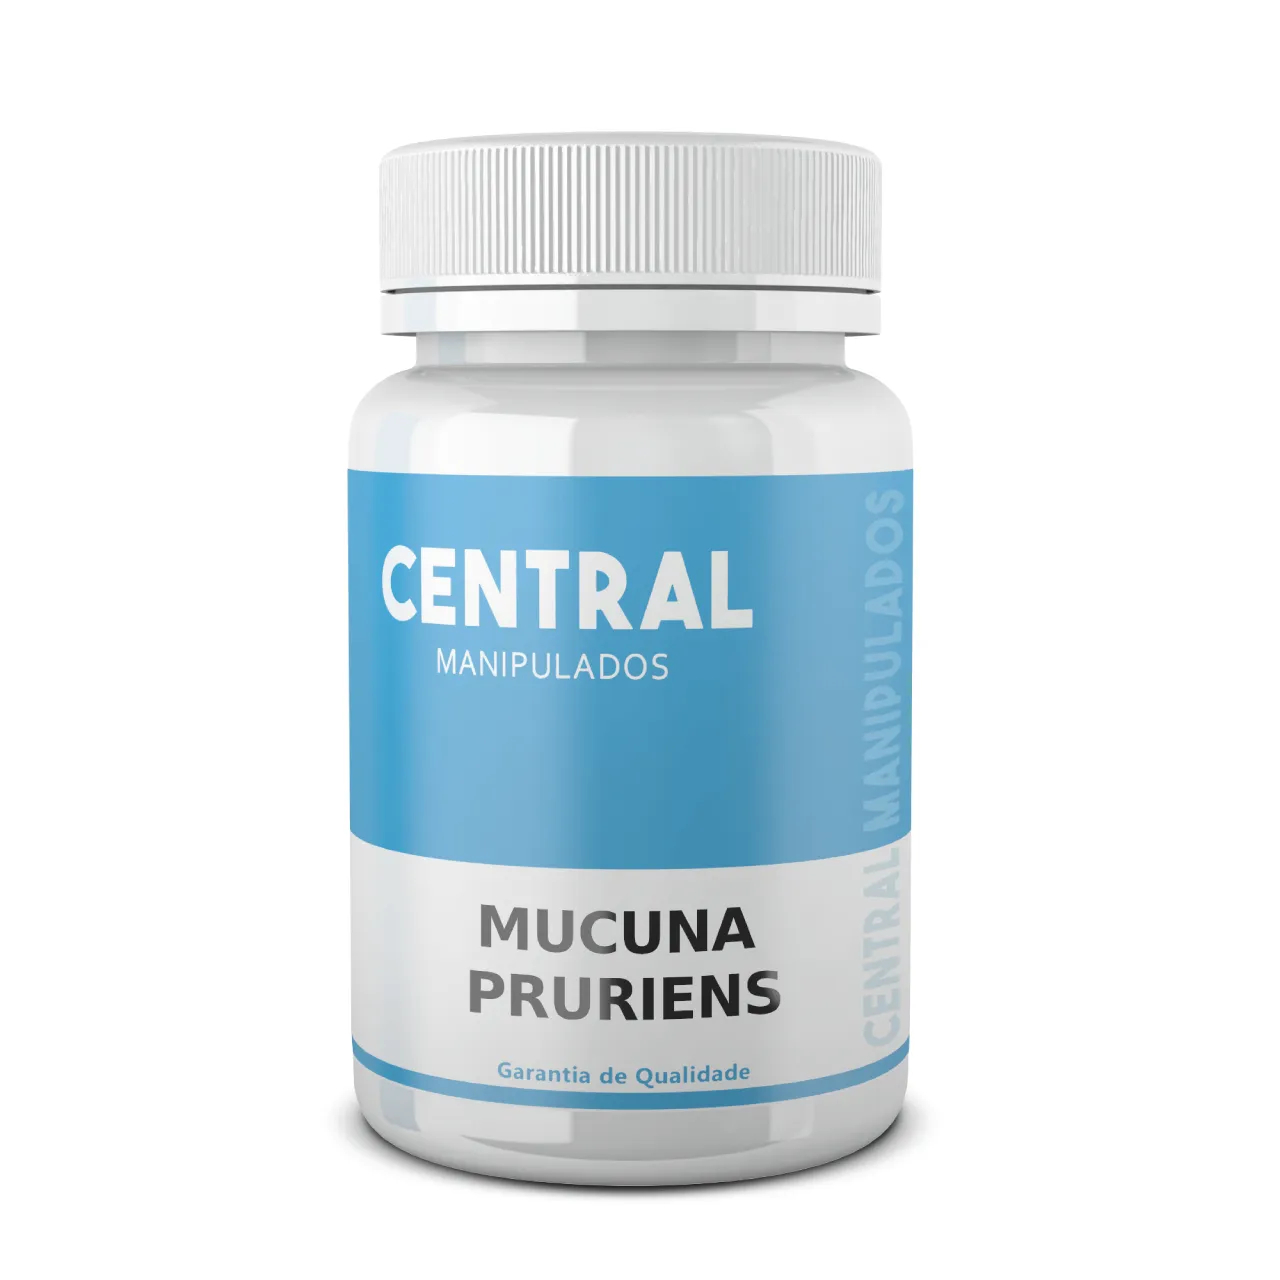 Mucuna Pruriens 400mg - 120 cápsulas - Performance, Aumento da Testosterona